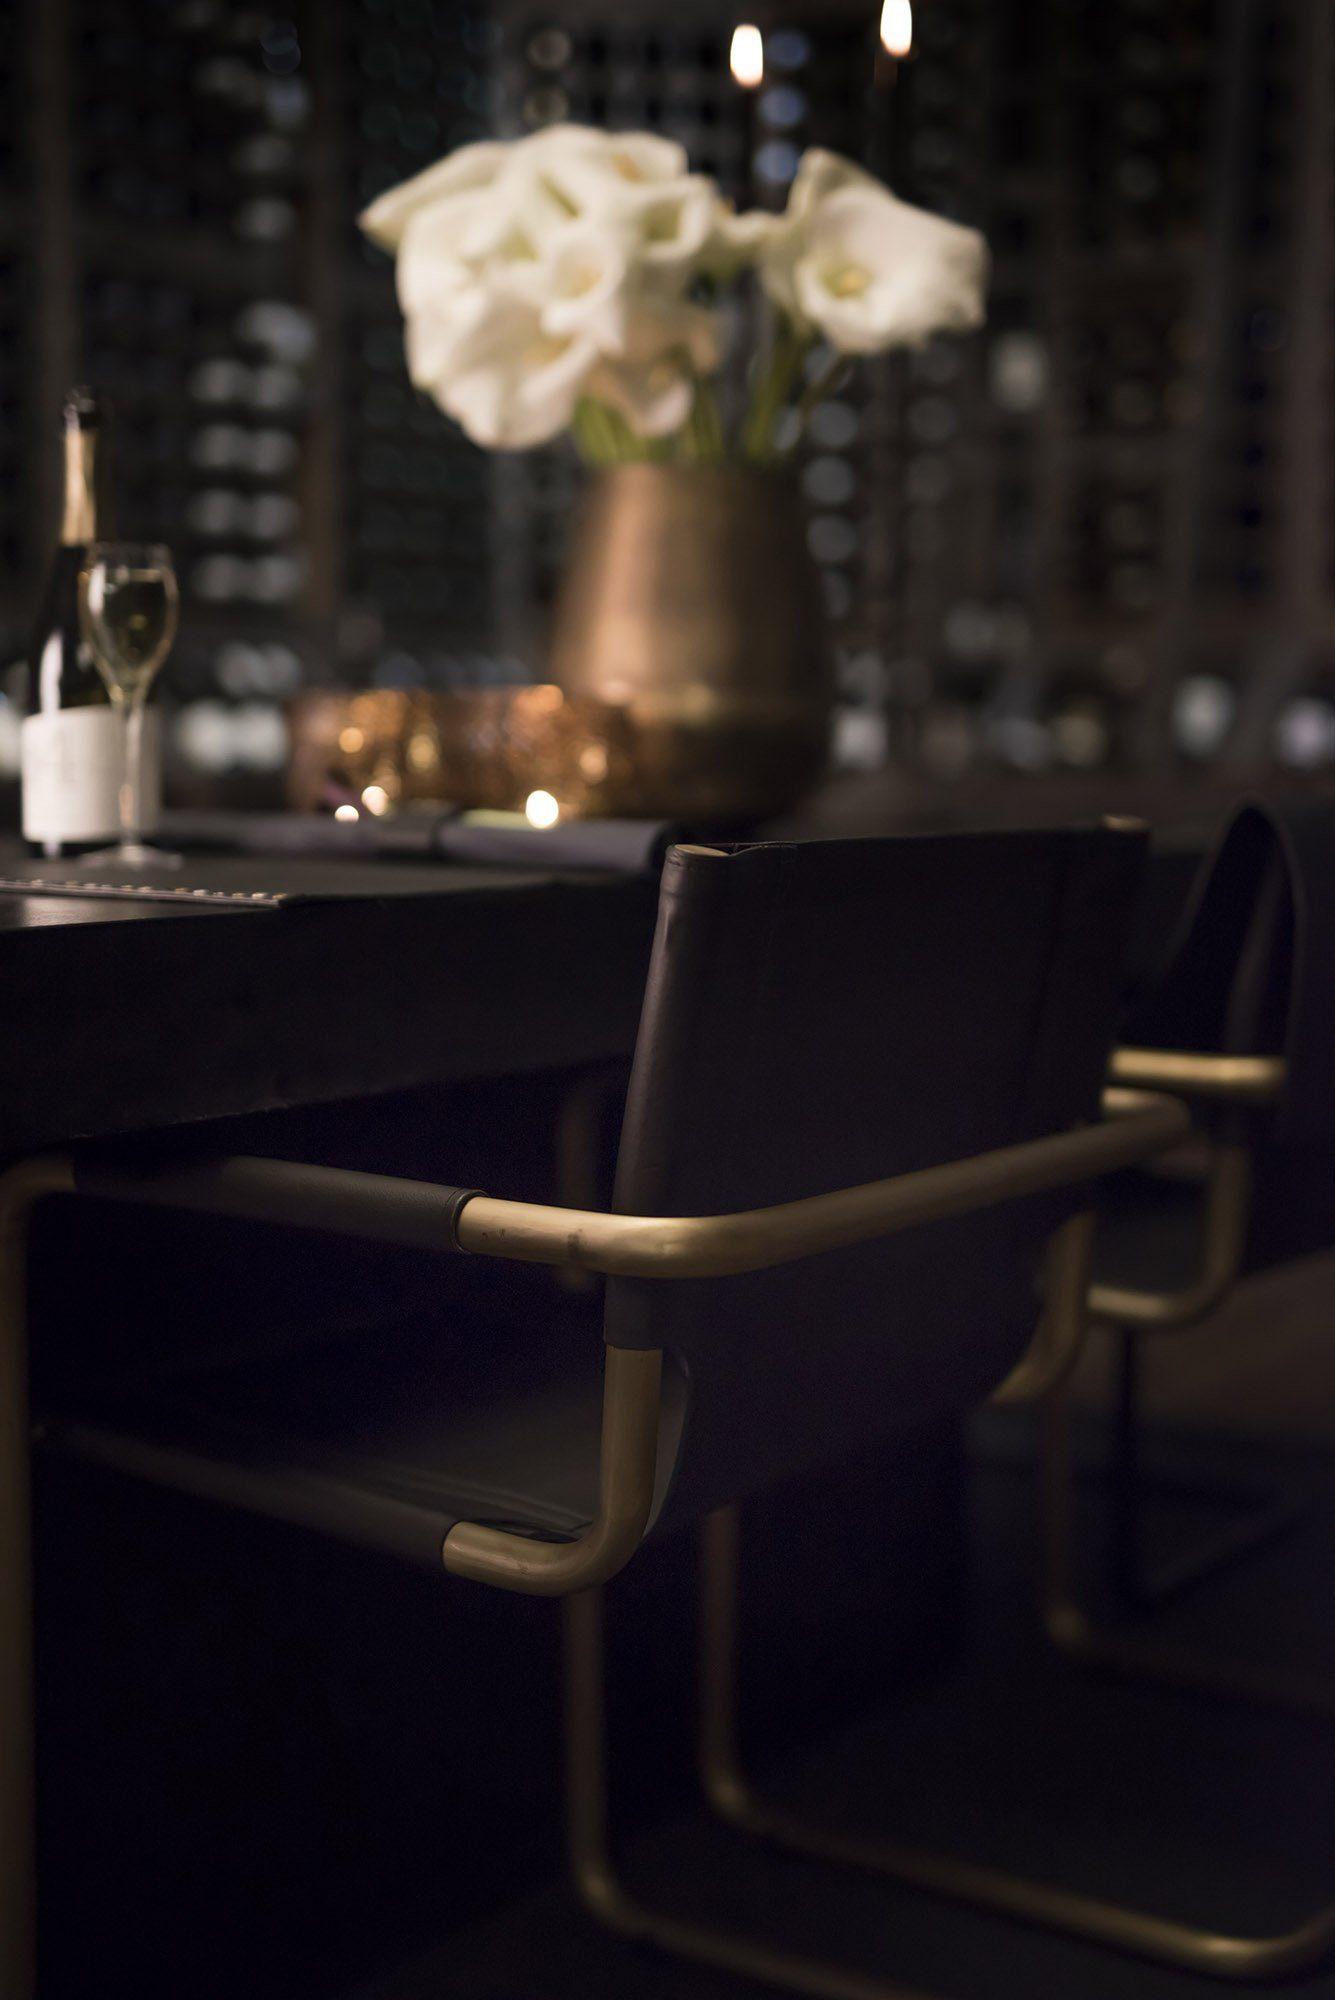 Gianni stol vid ett Campos matbord i svart.